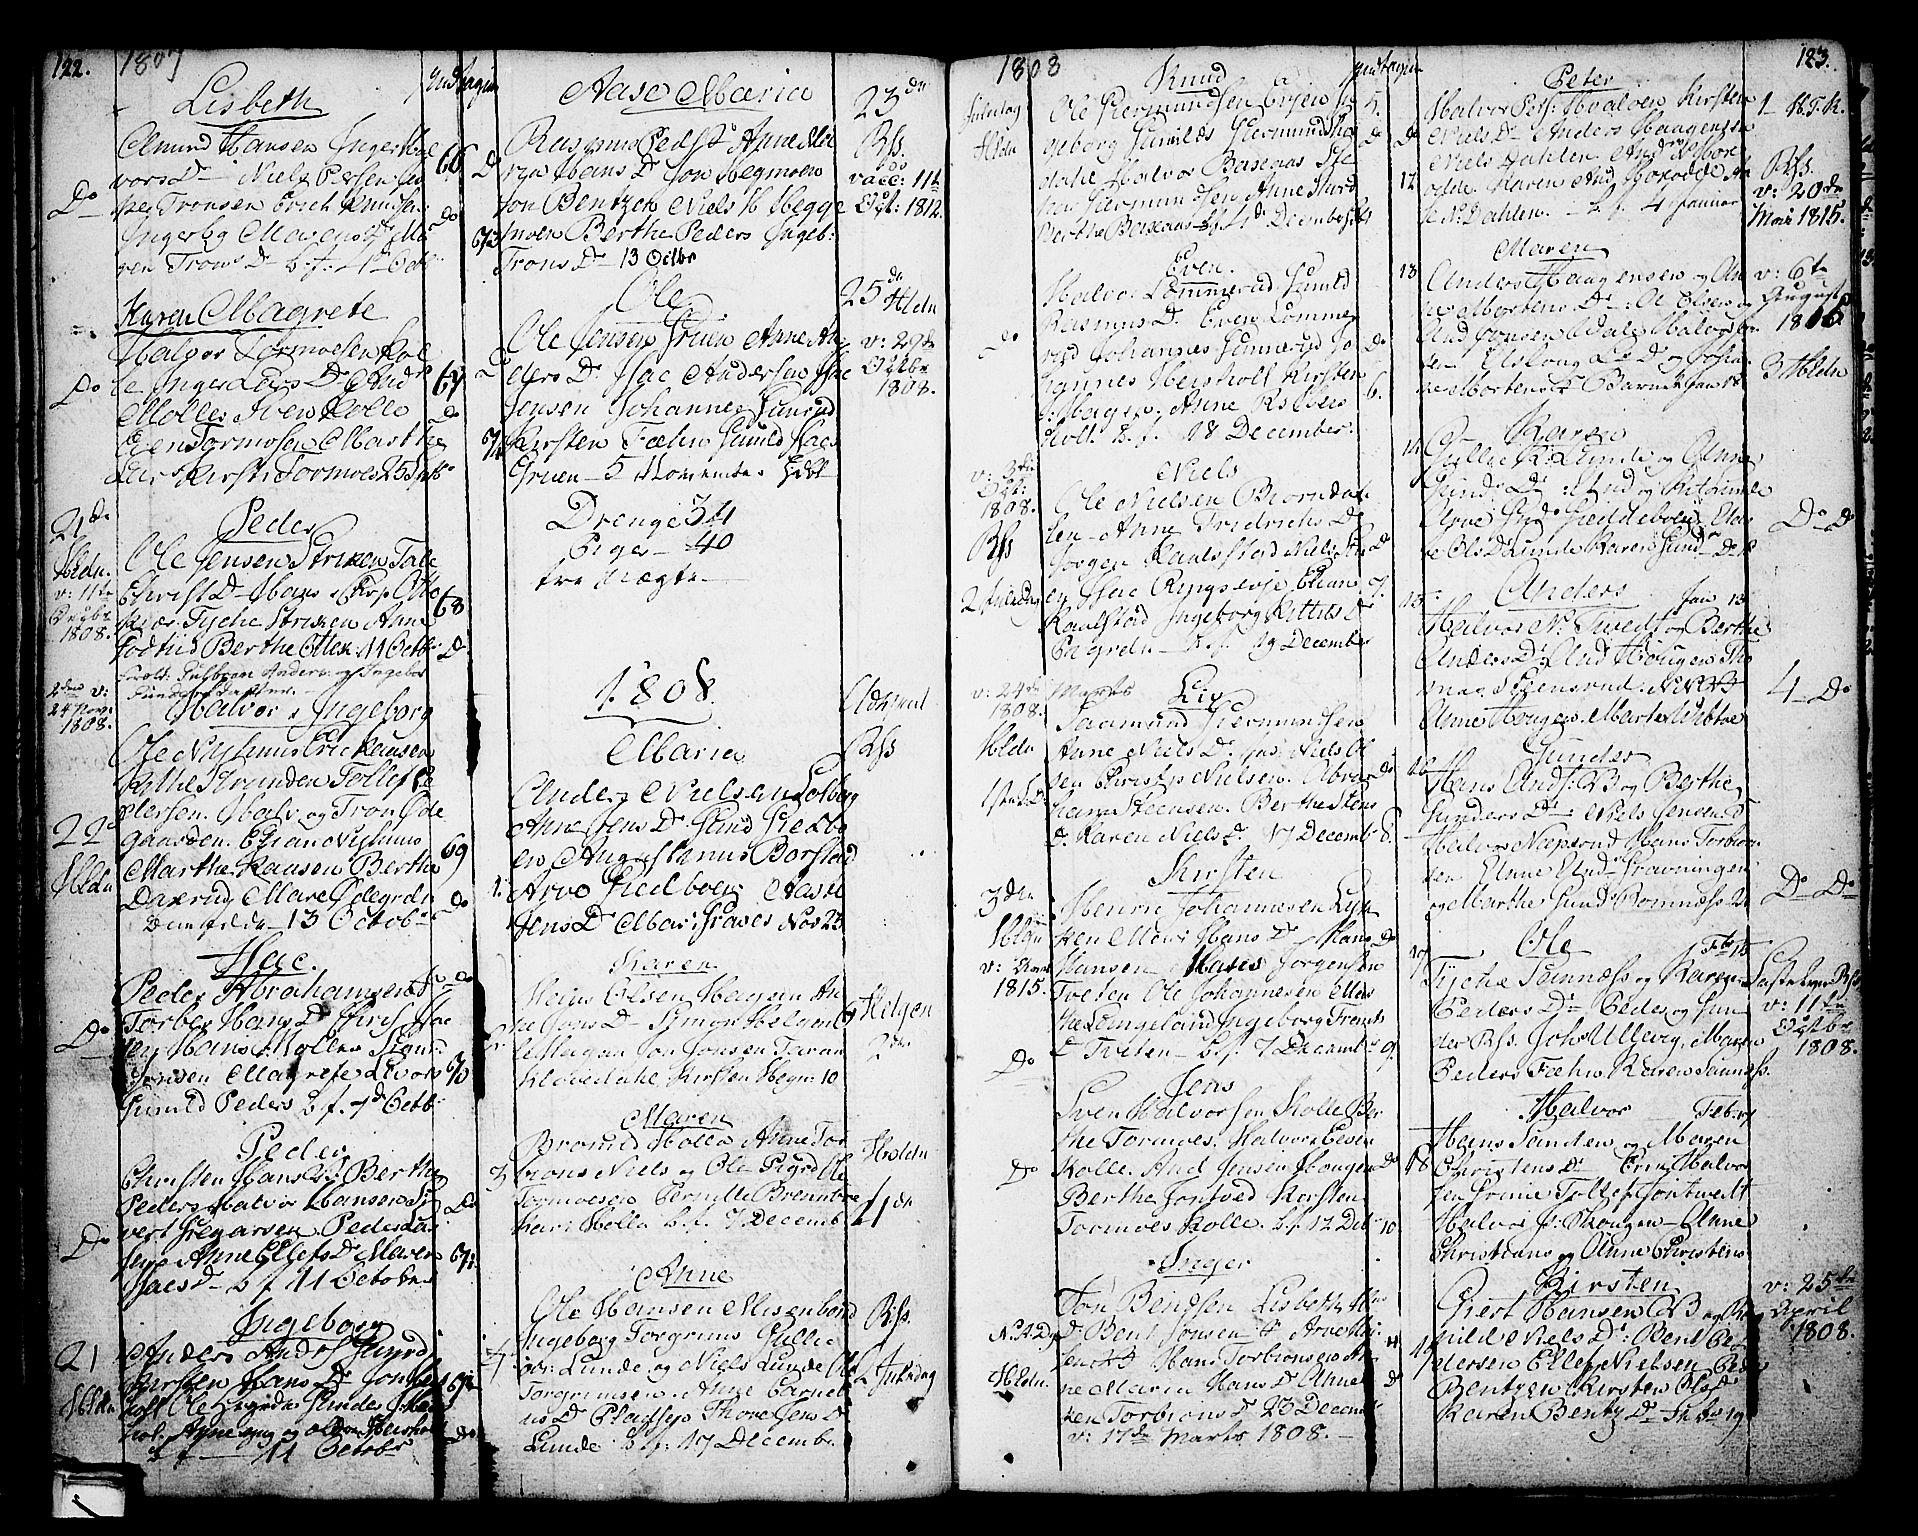 SAKO, Holla kirkebøker, F/Fa/L0002: Ministerialbok nr. 2, 1779-1814, s. 122-123